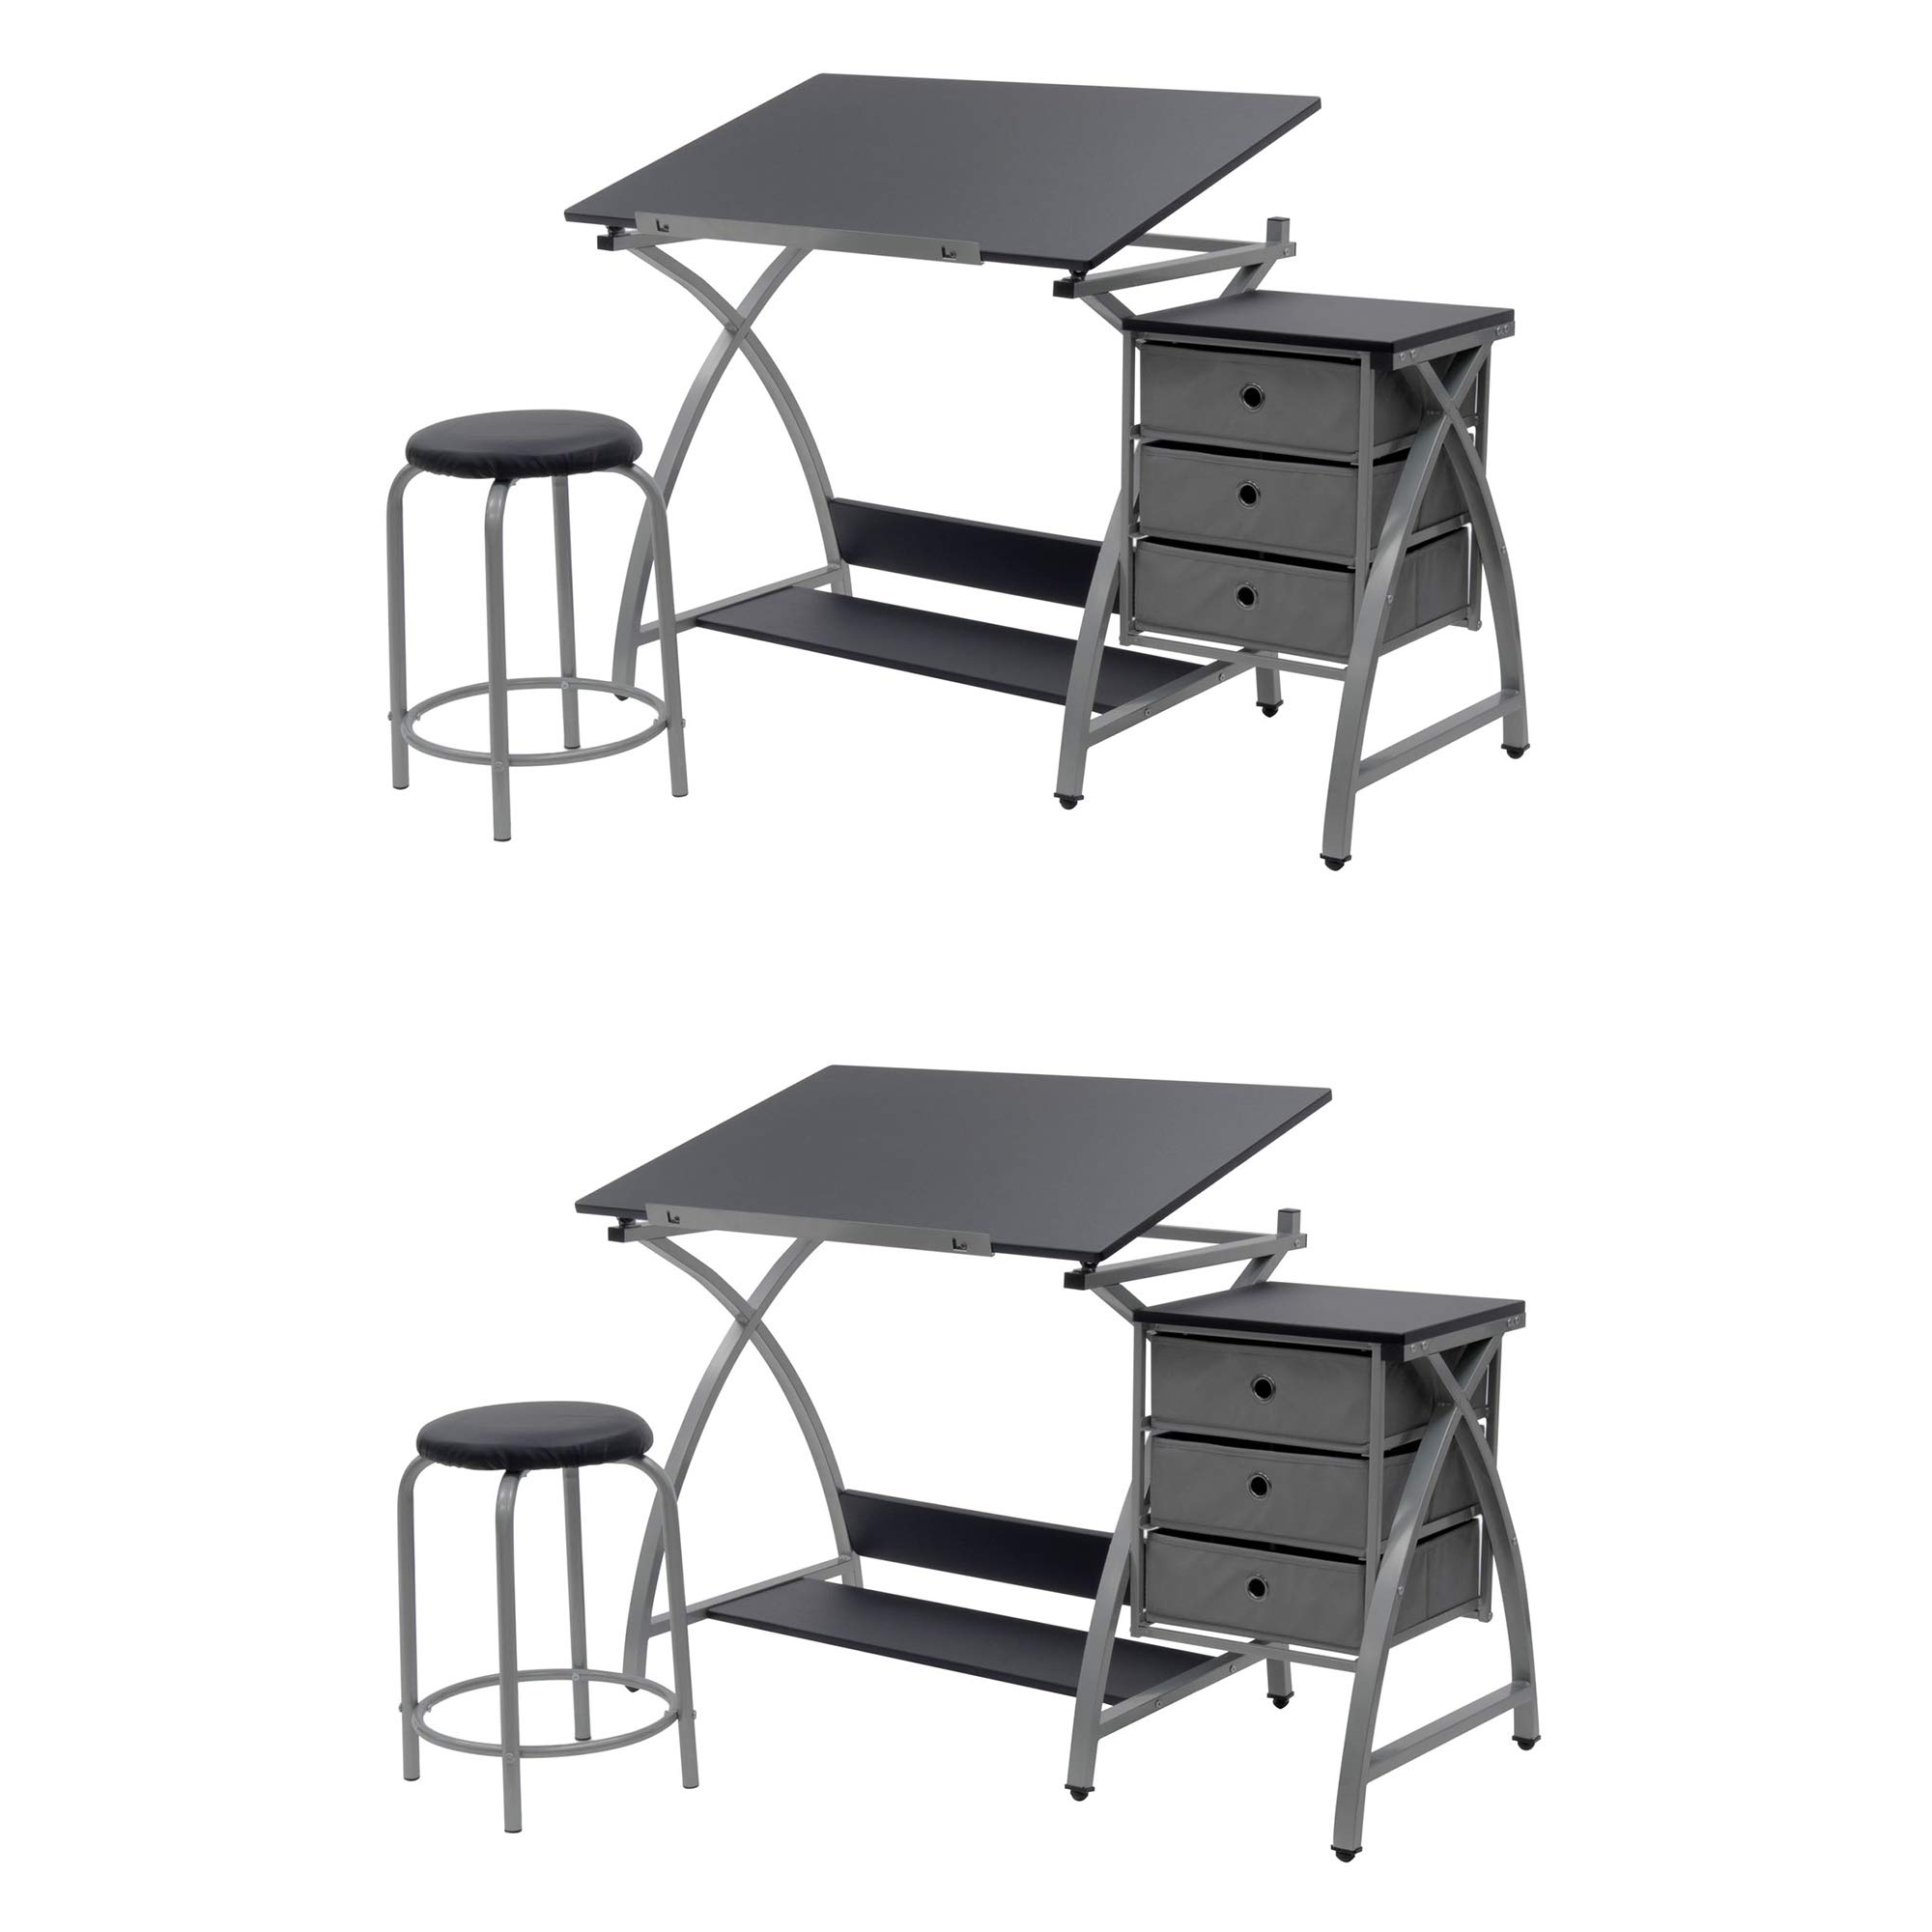 Studio Designs Laminate Craft Table Comet Center with Stool, Black (2 Pack)